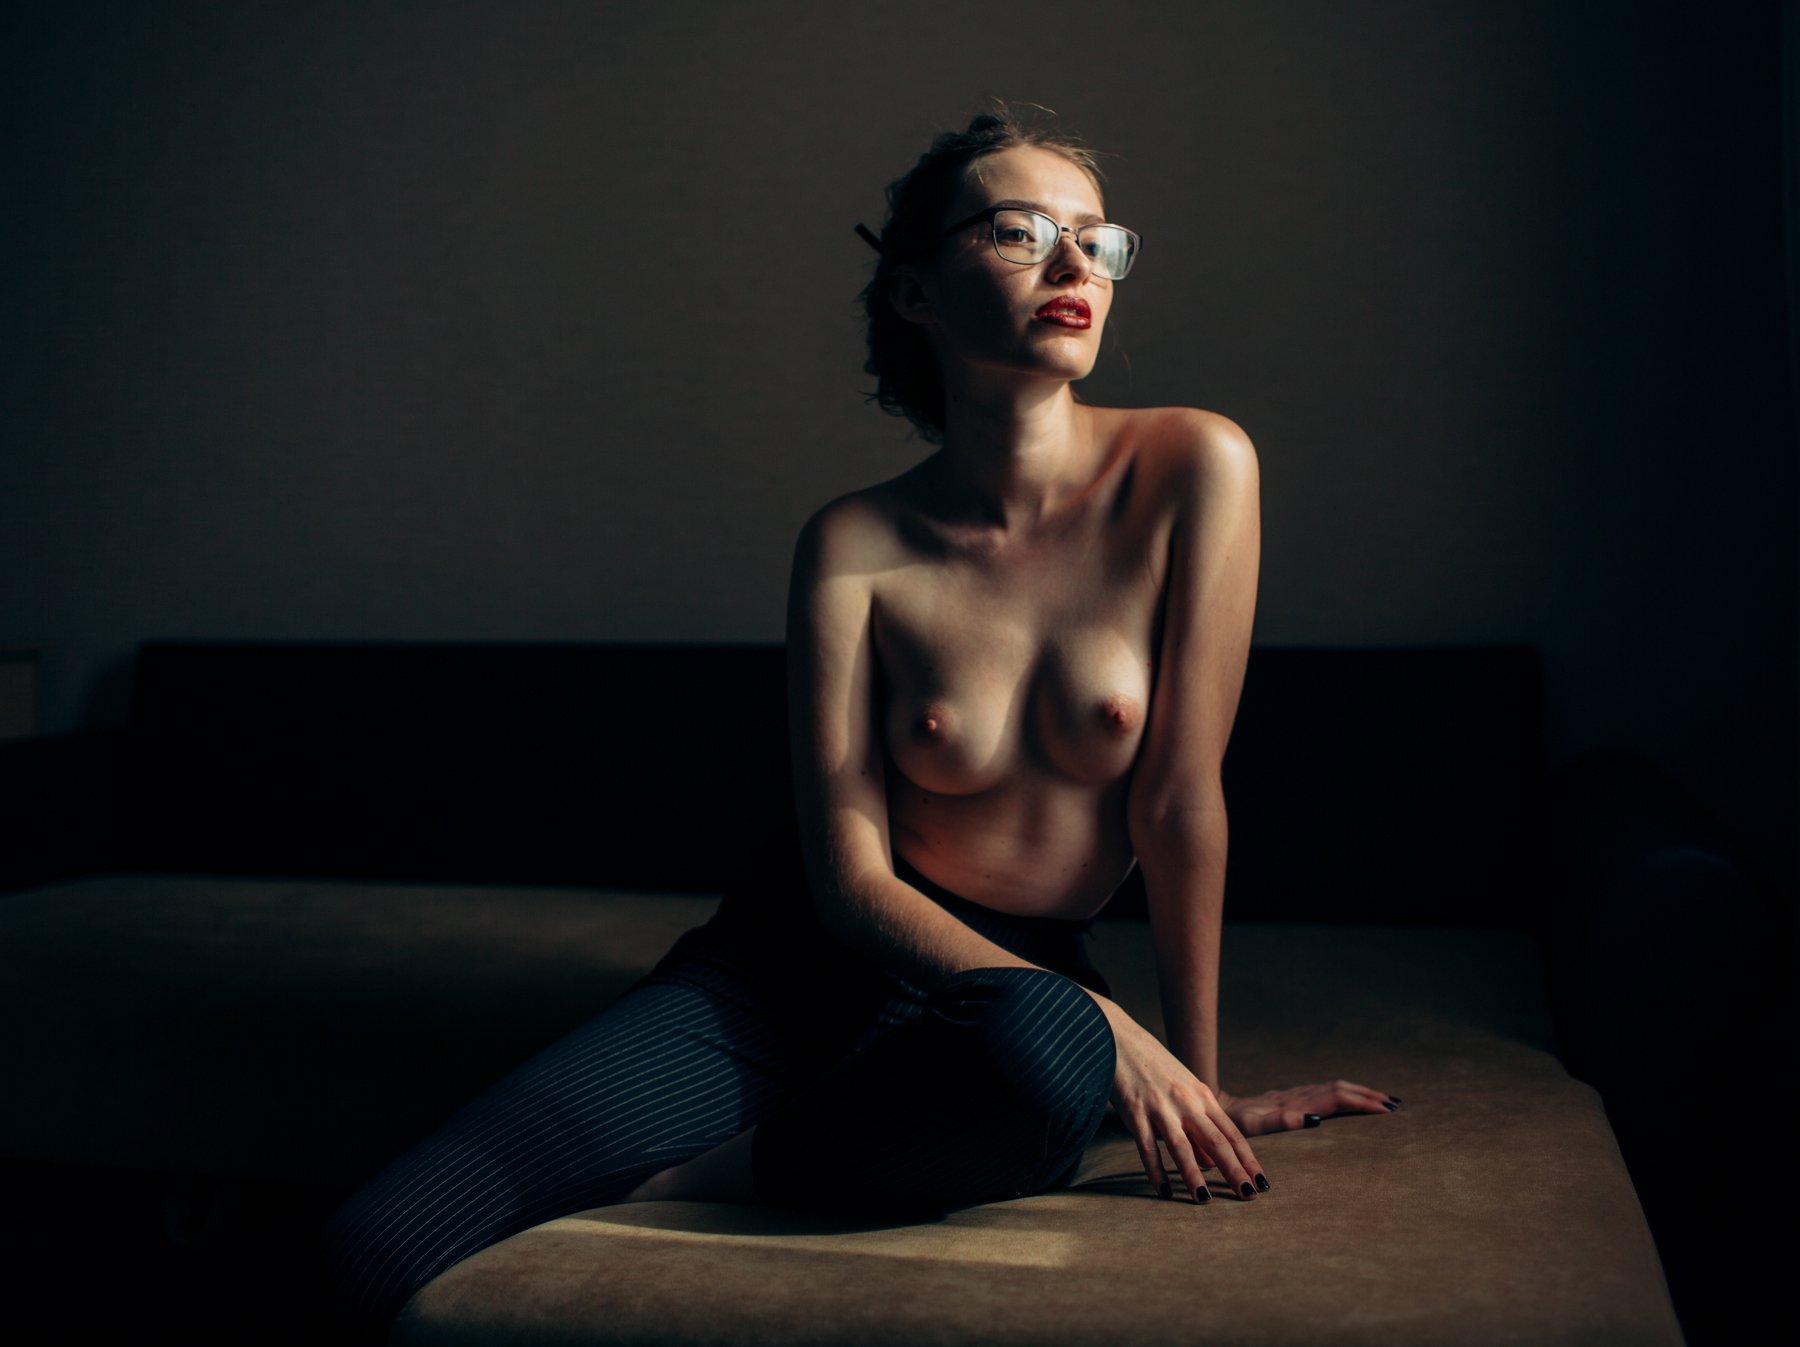 girl, at home, nude, light, glasses, Роман Филиппов